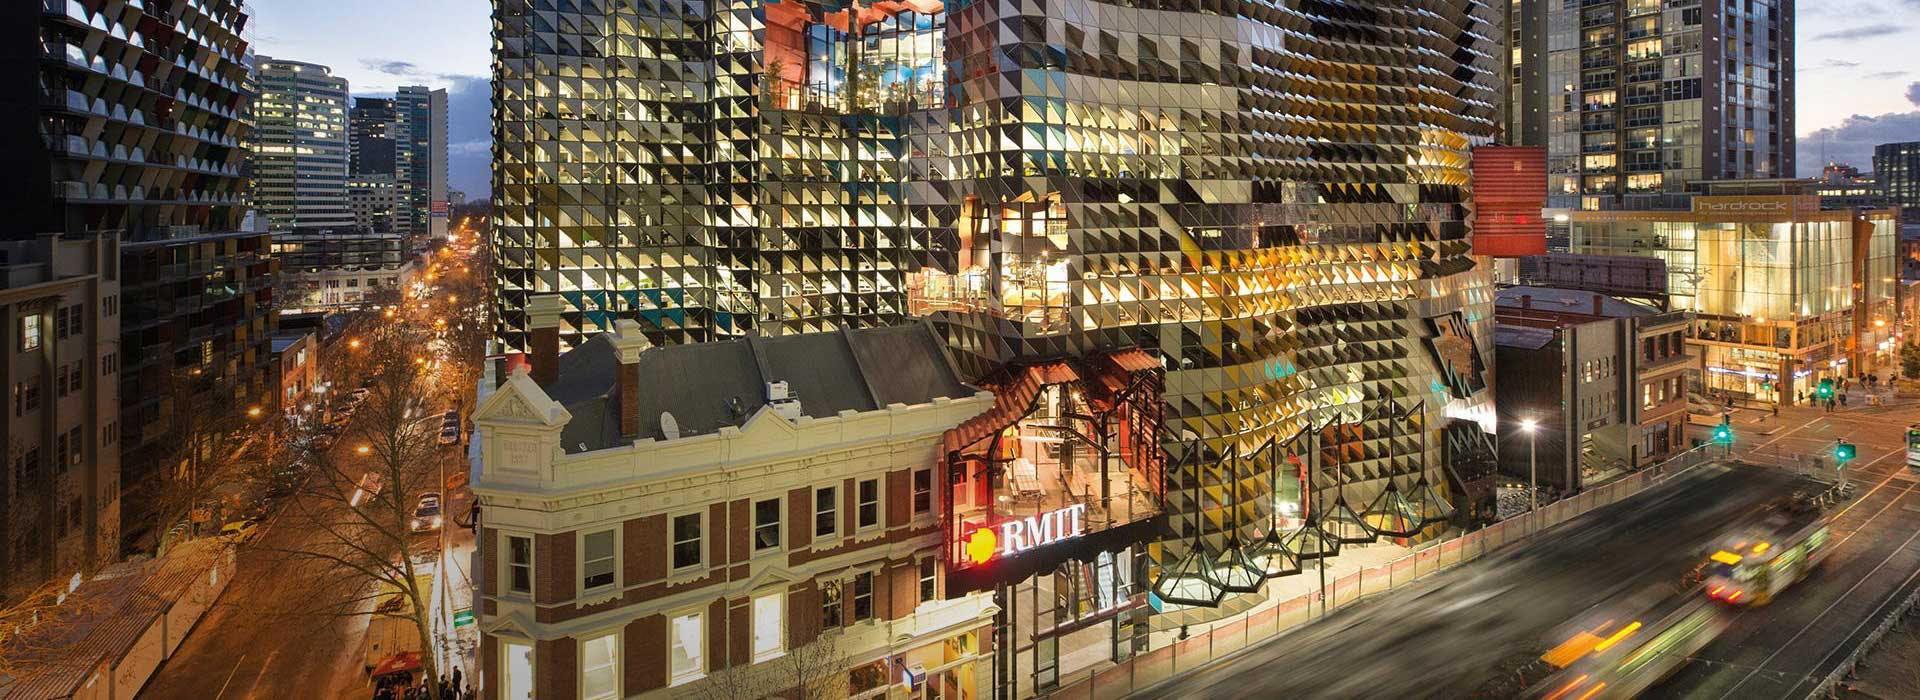 DU HỌC ÚC 2021: REVIEW TOP 4 NGÀNH HỌC TẠI RMIT MELBOURNE